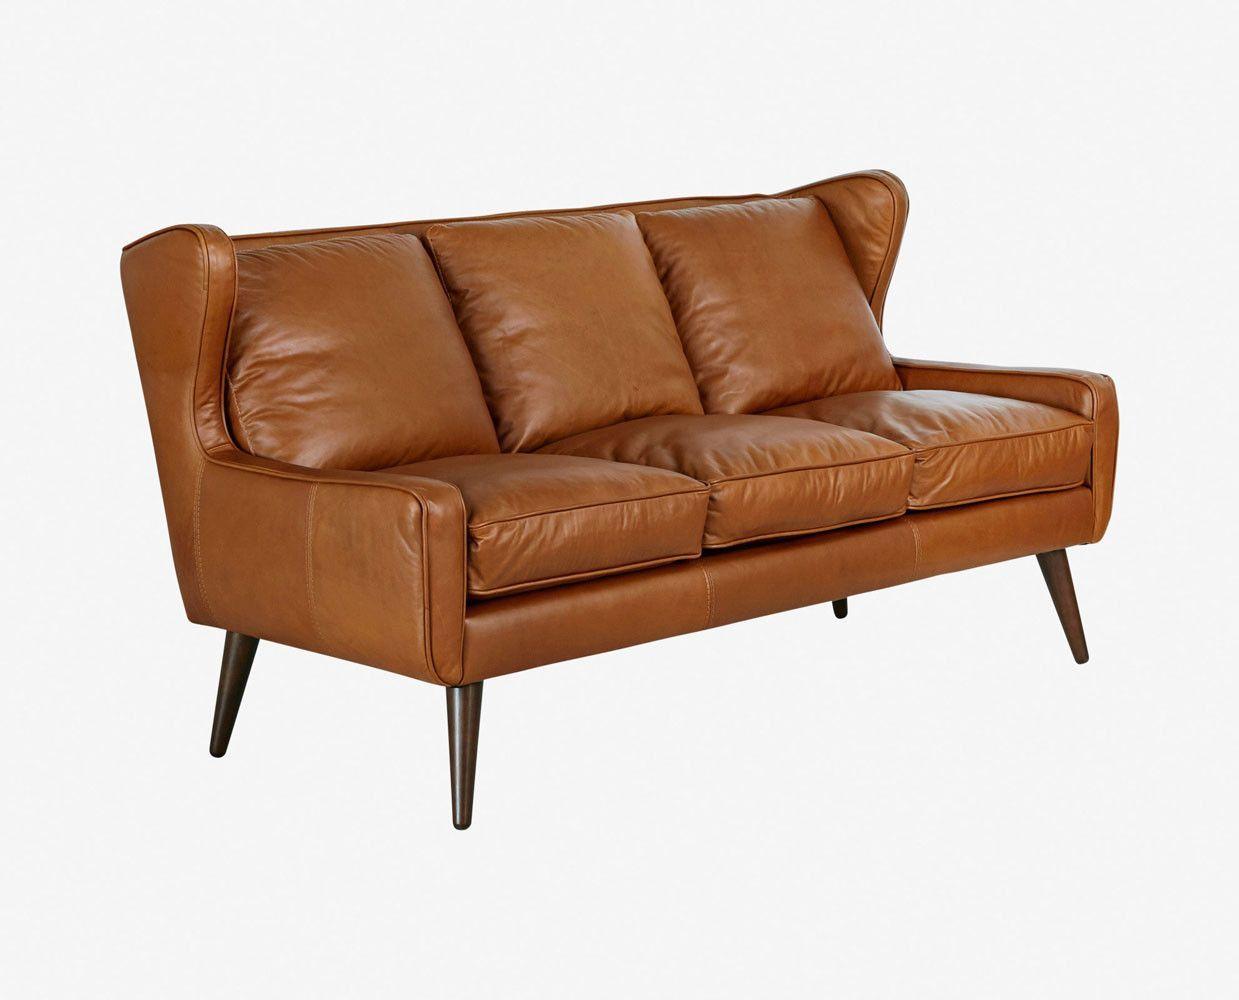 Giesen Sofa Loveseats